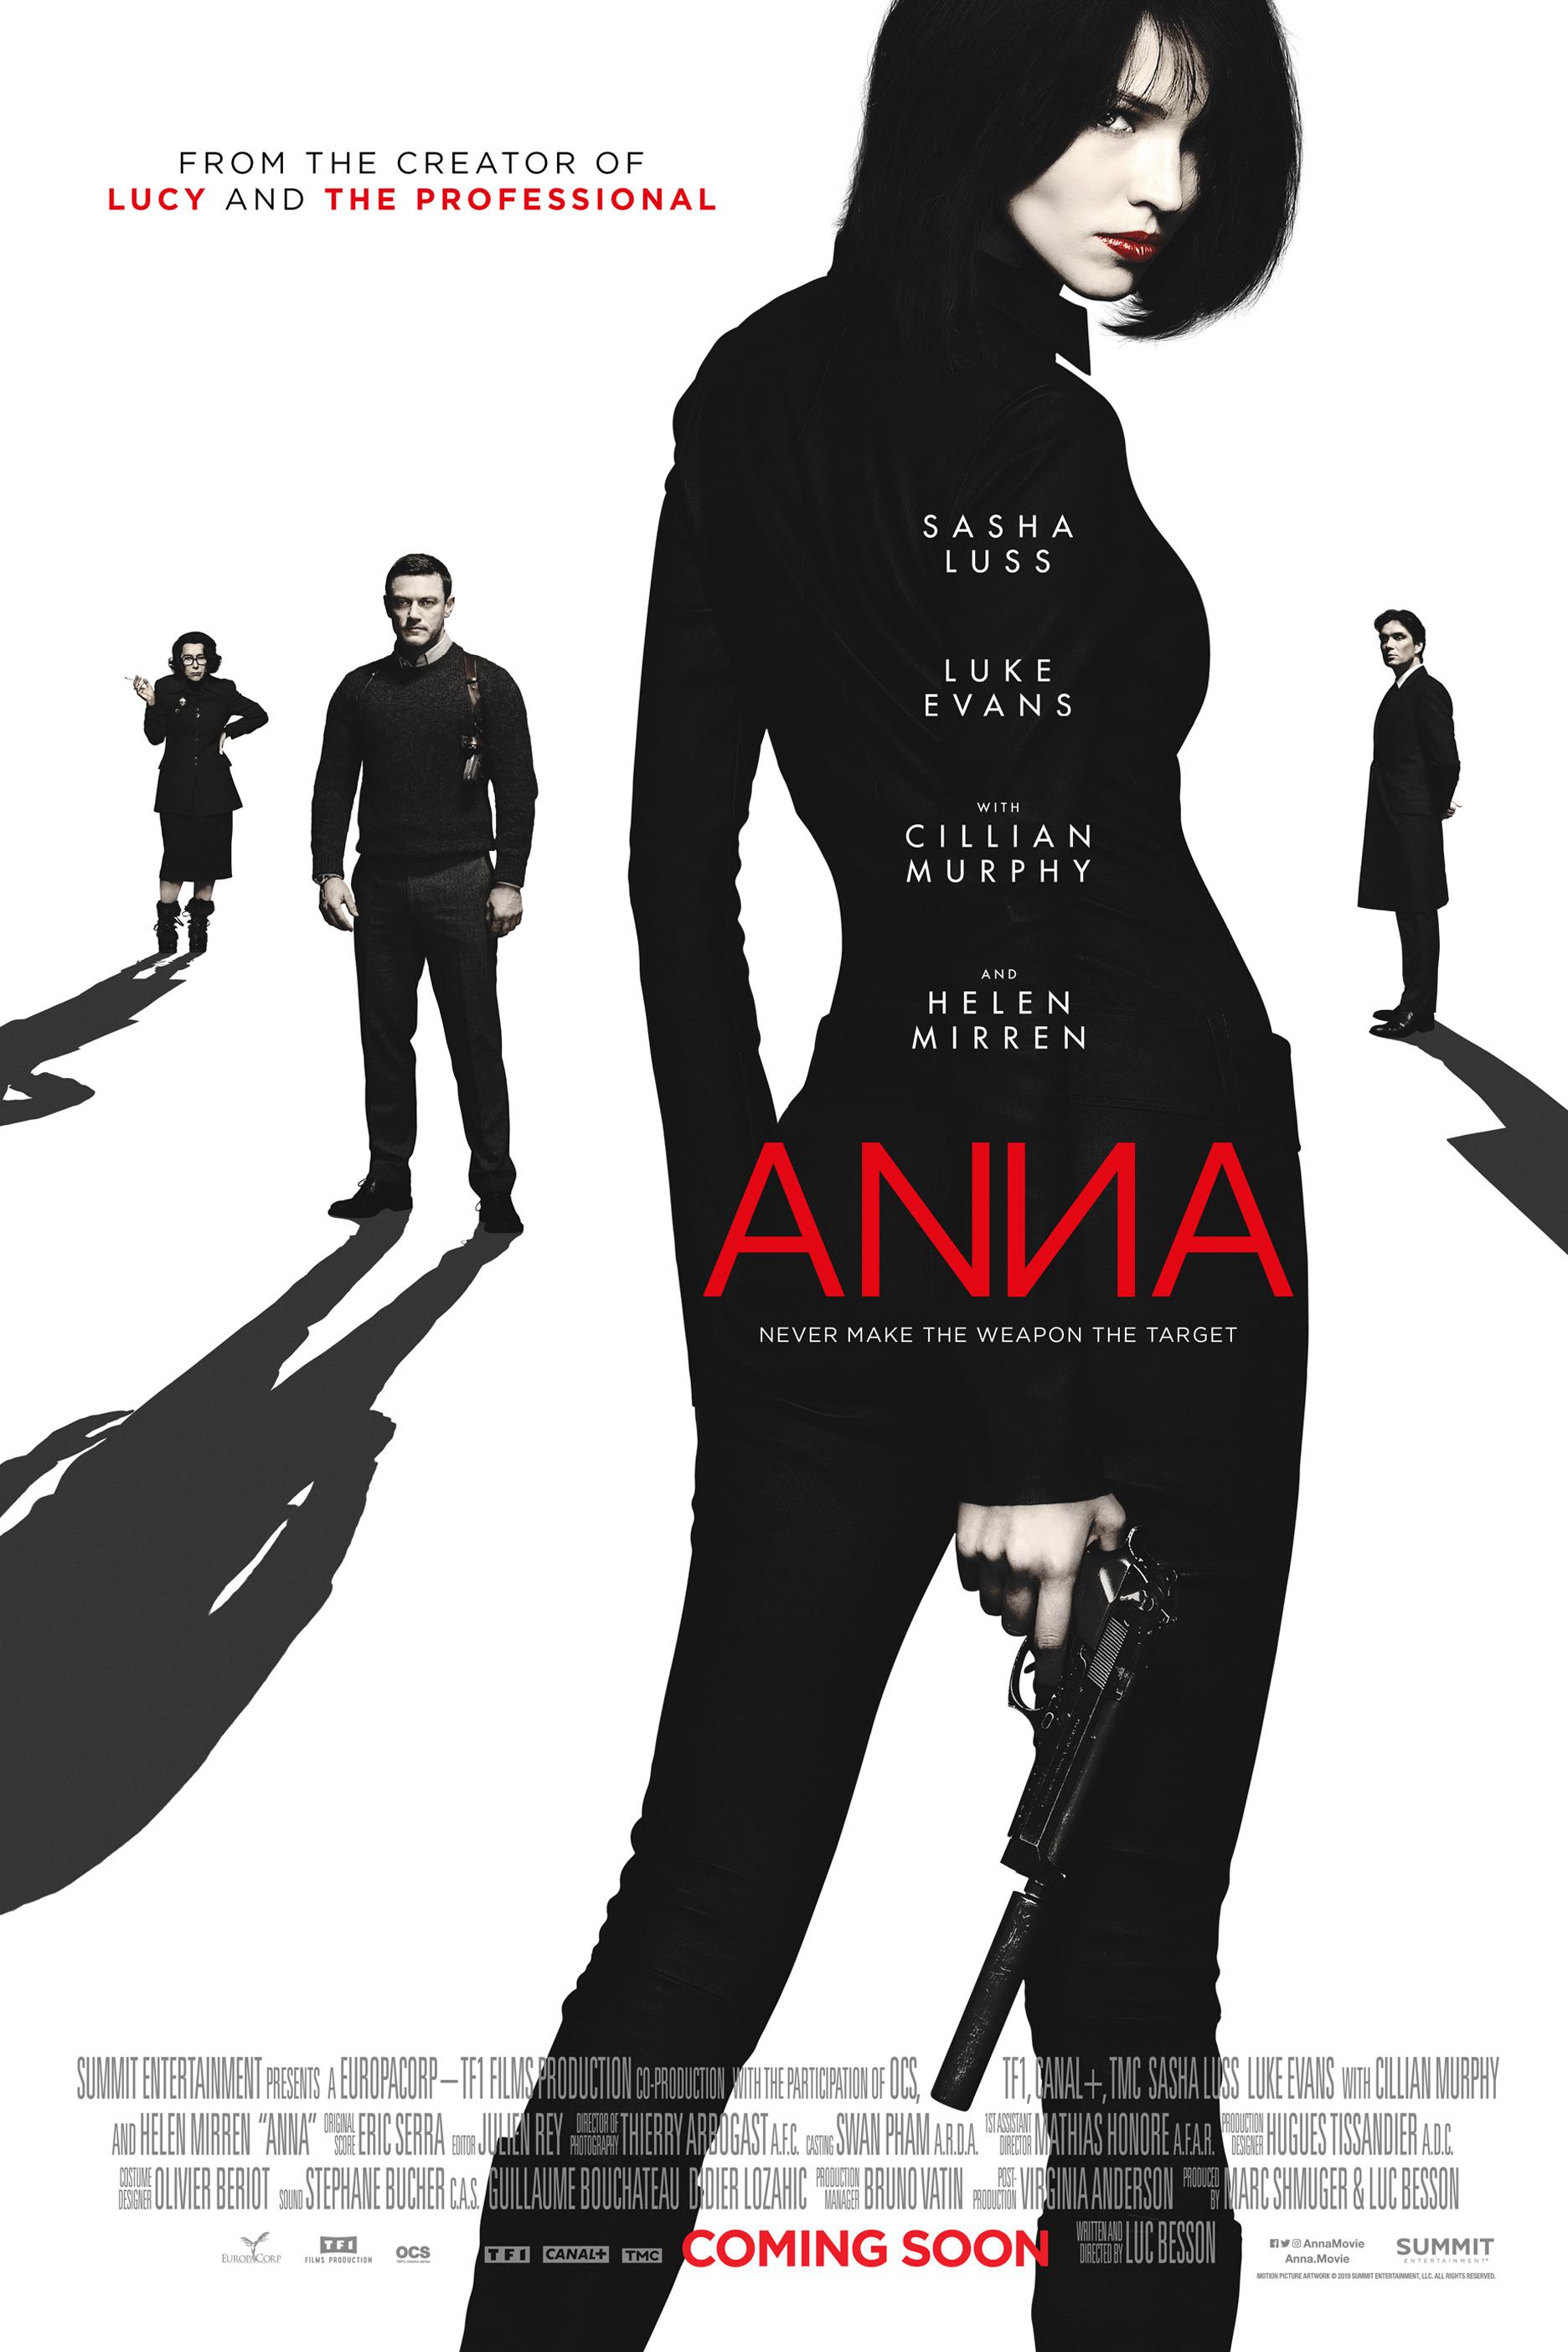 Sasha Luss  - 'Anna' Posters 2019